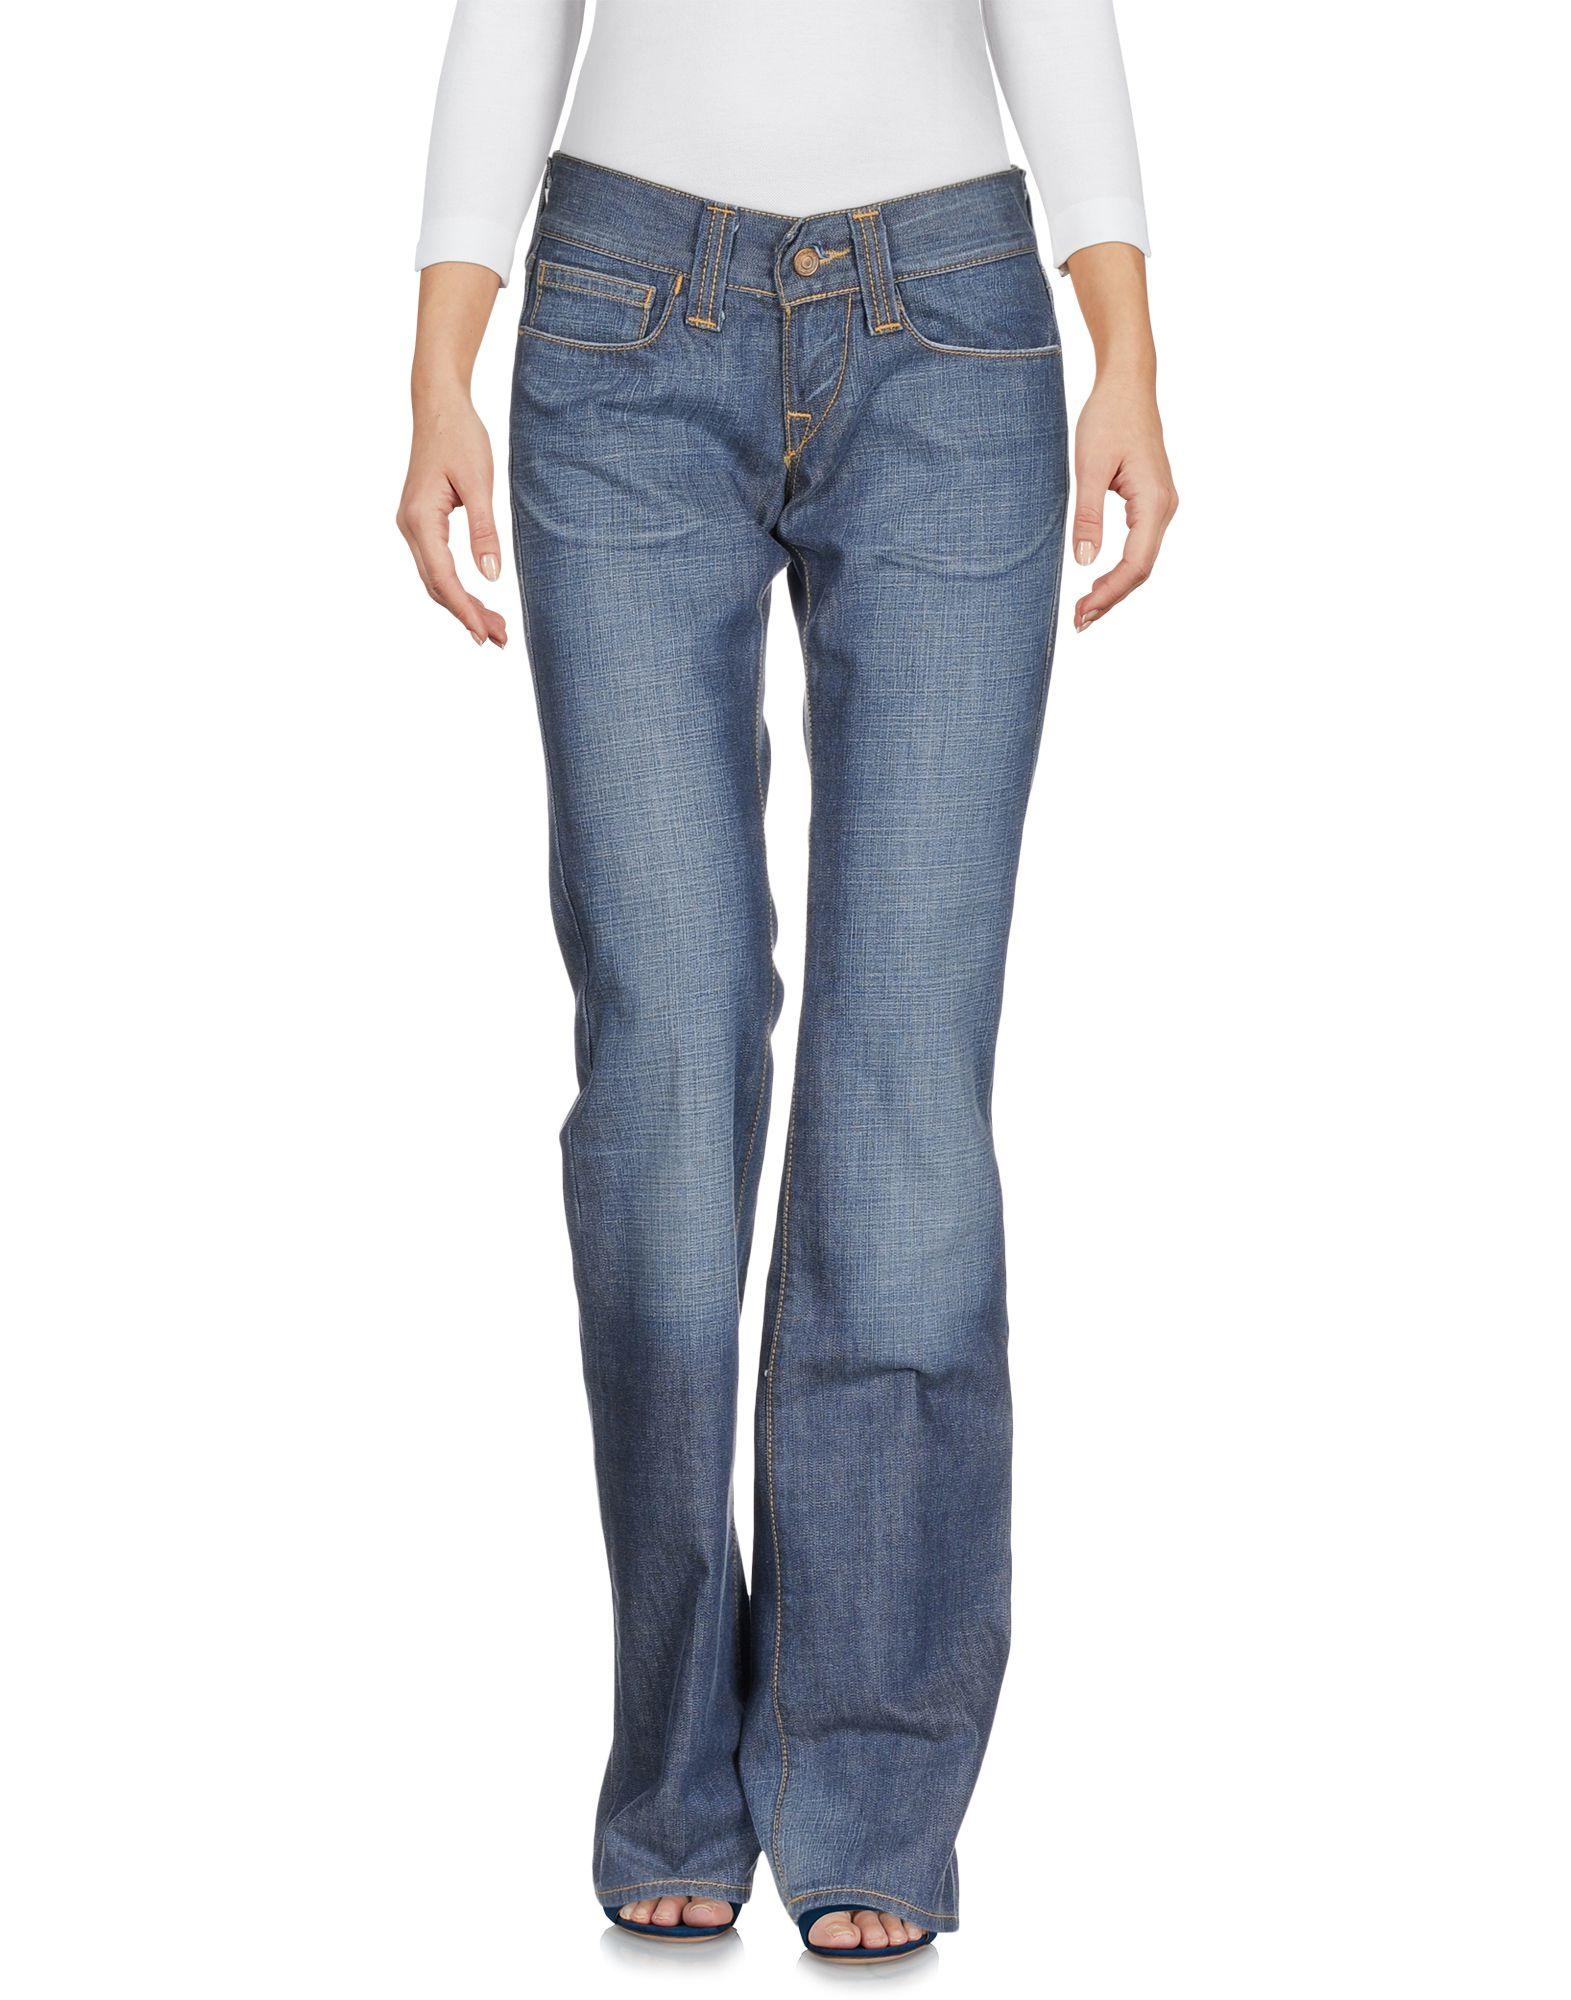 huge selection of d17e9 eaad6 FORNARINA Denim pants - Jeans and Denim   YOOX.COM